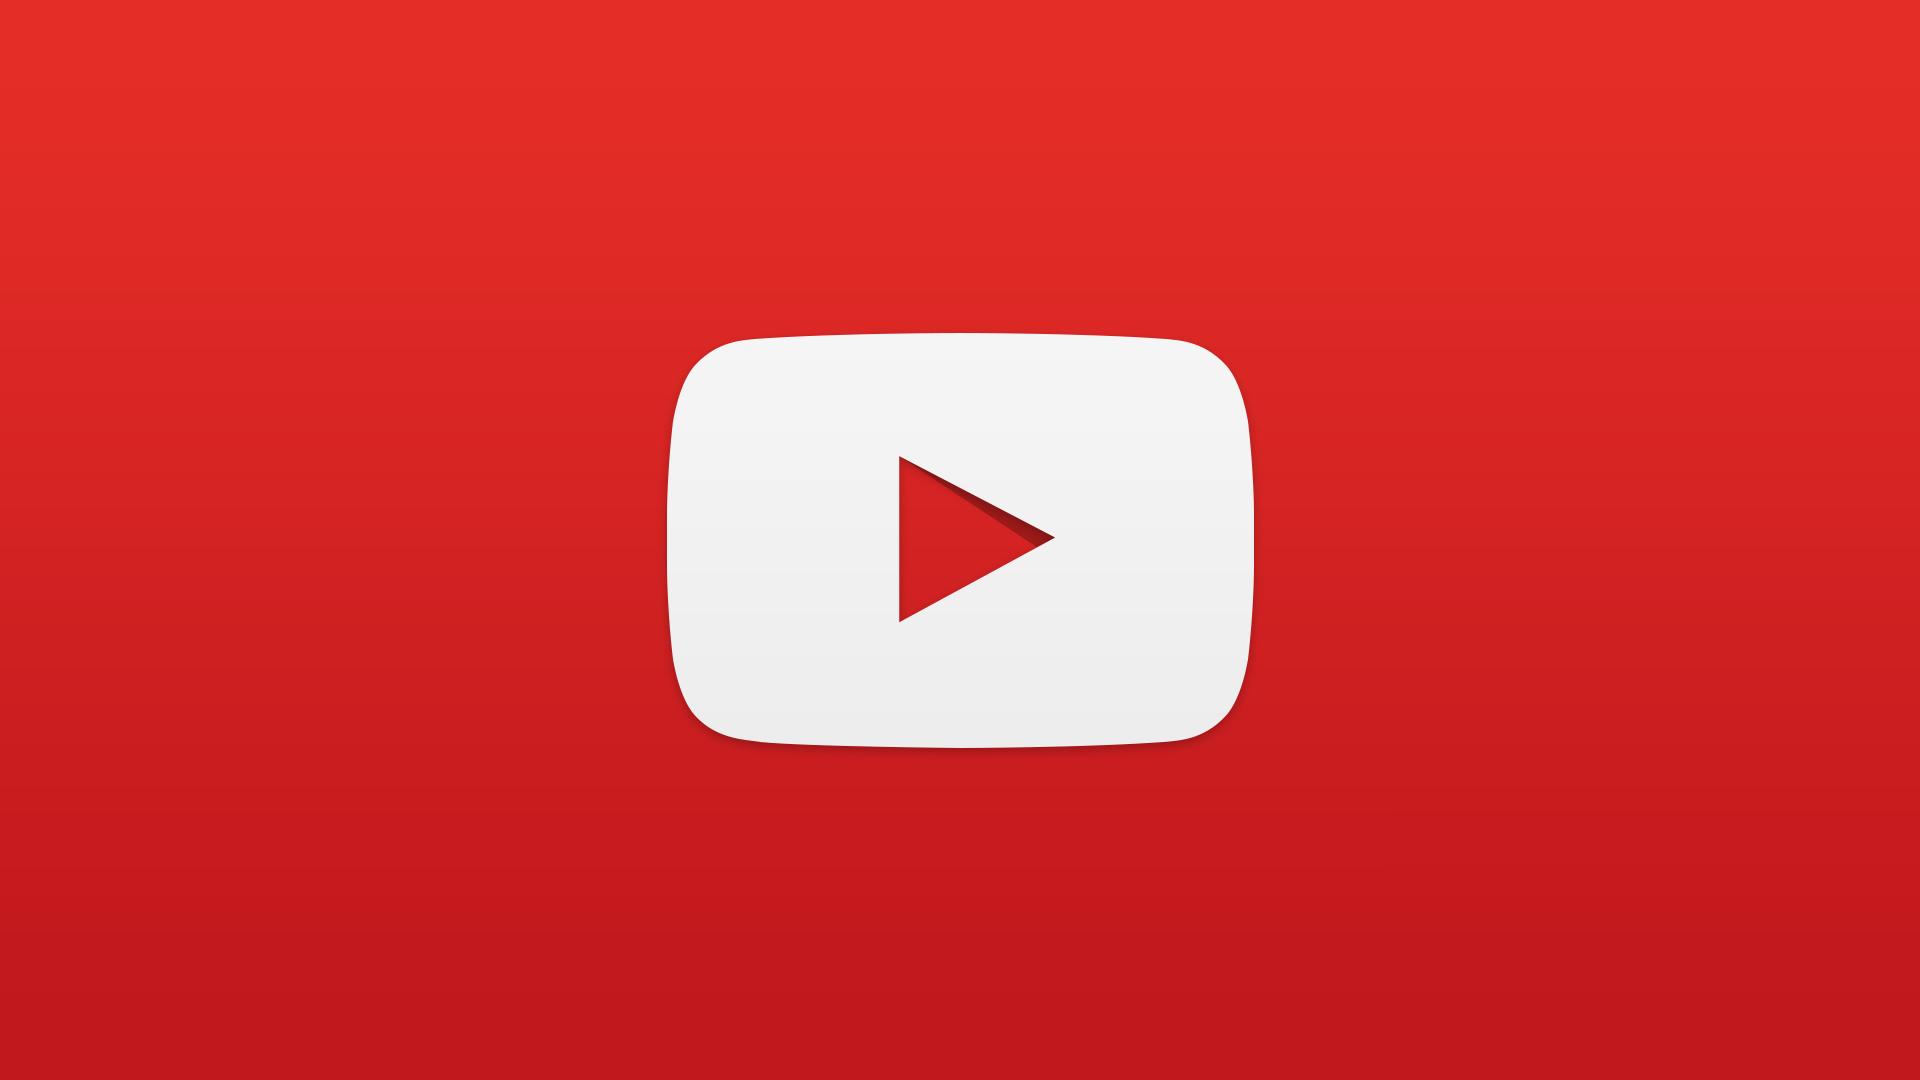 Youtube-Wallpaper-Iphone-